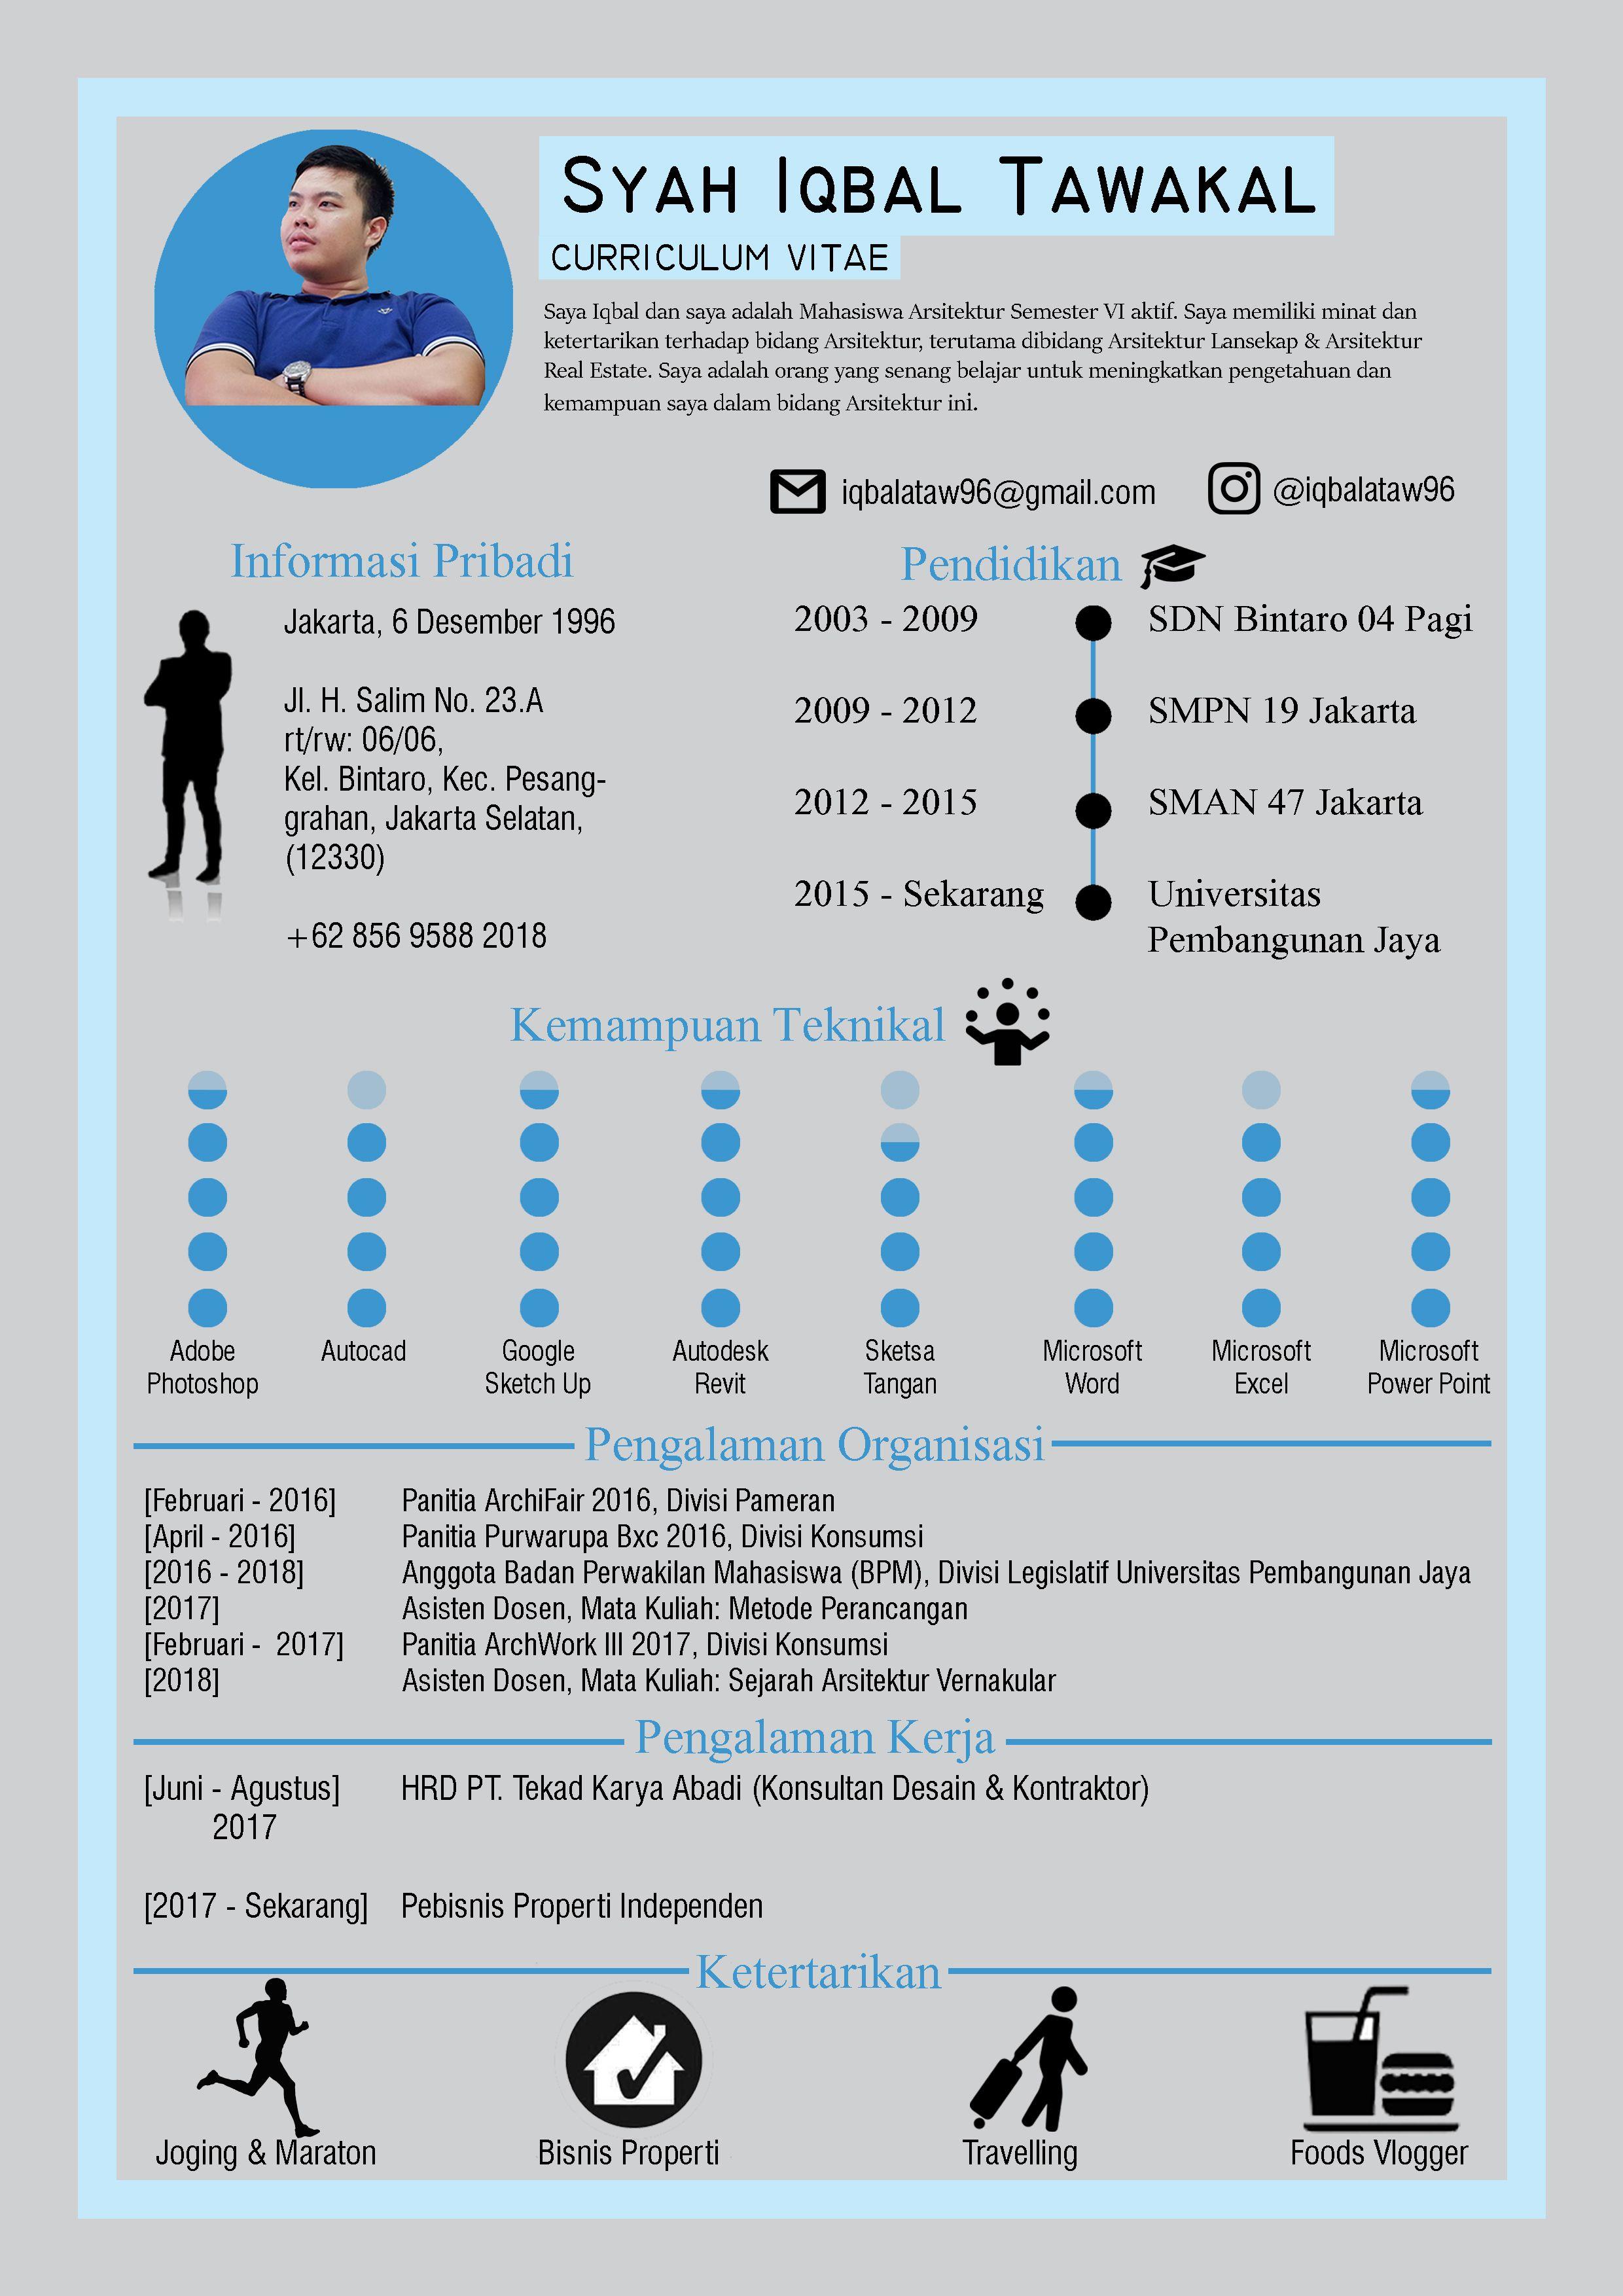 Indonesia Curriculum Vitae About Me Pinterest Curriculum And